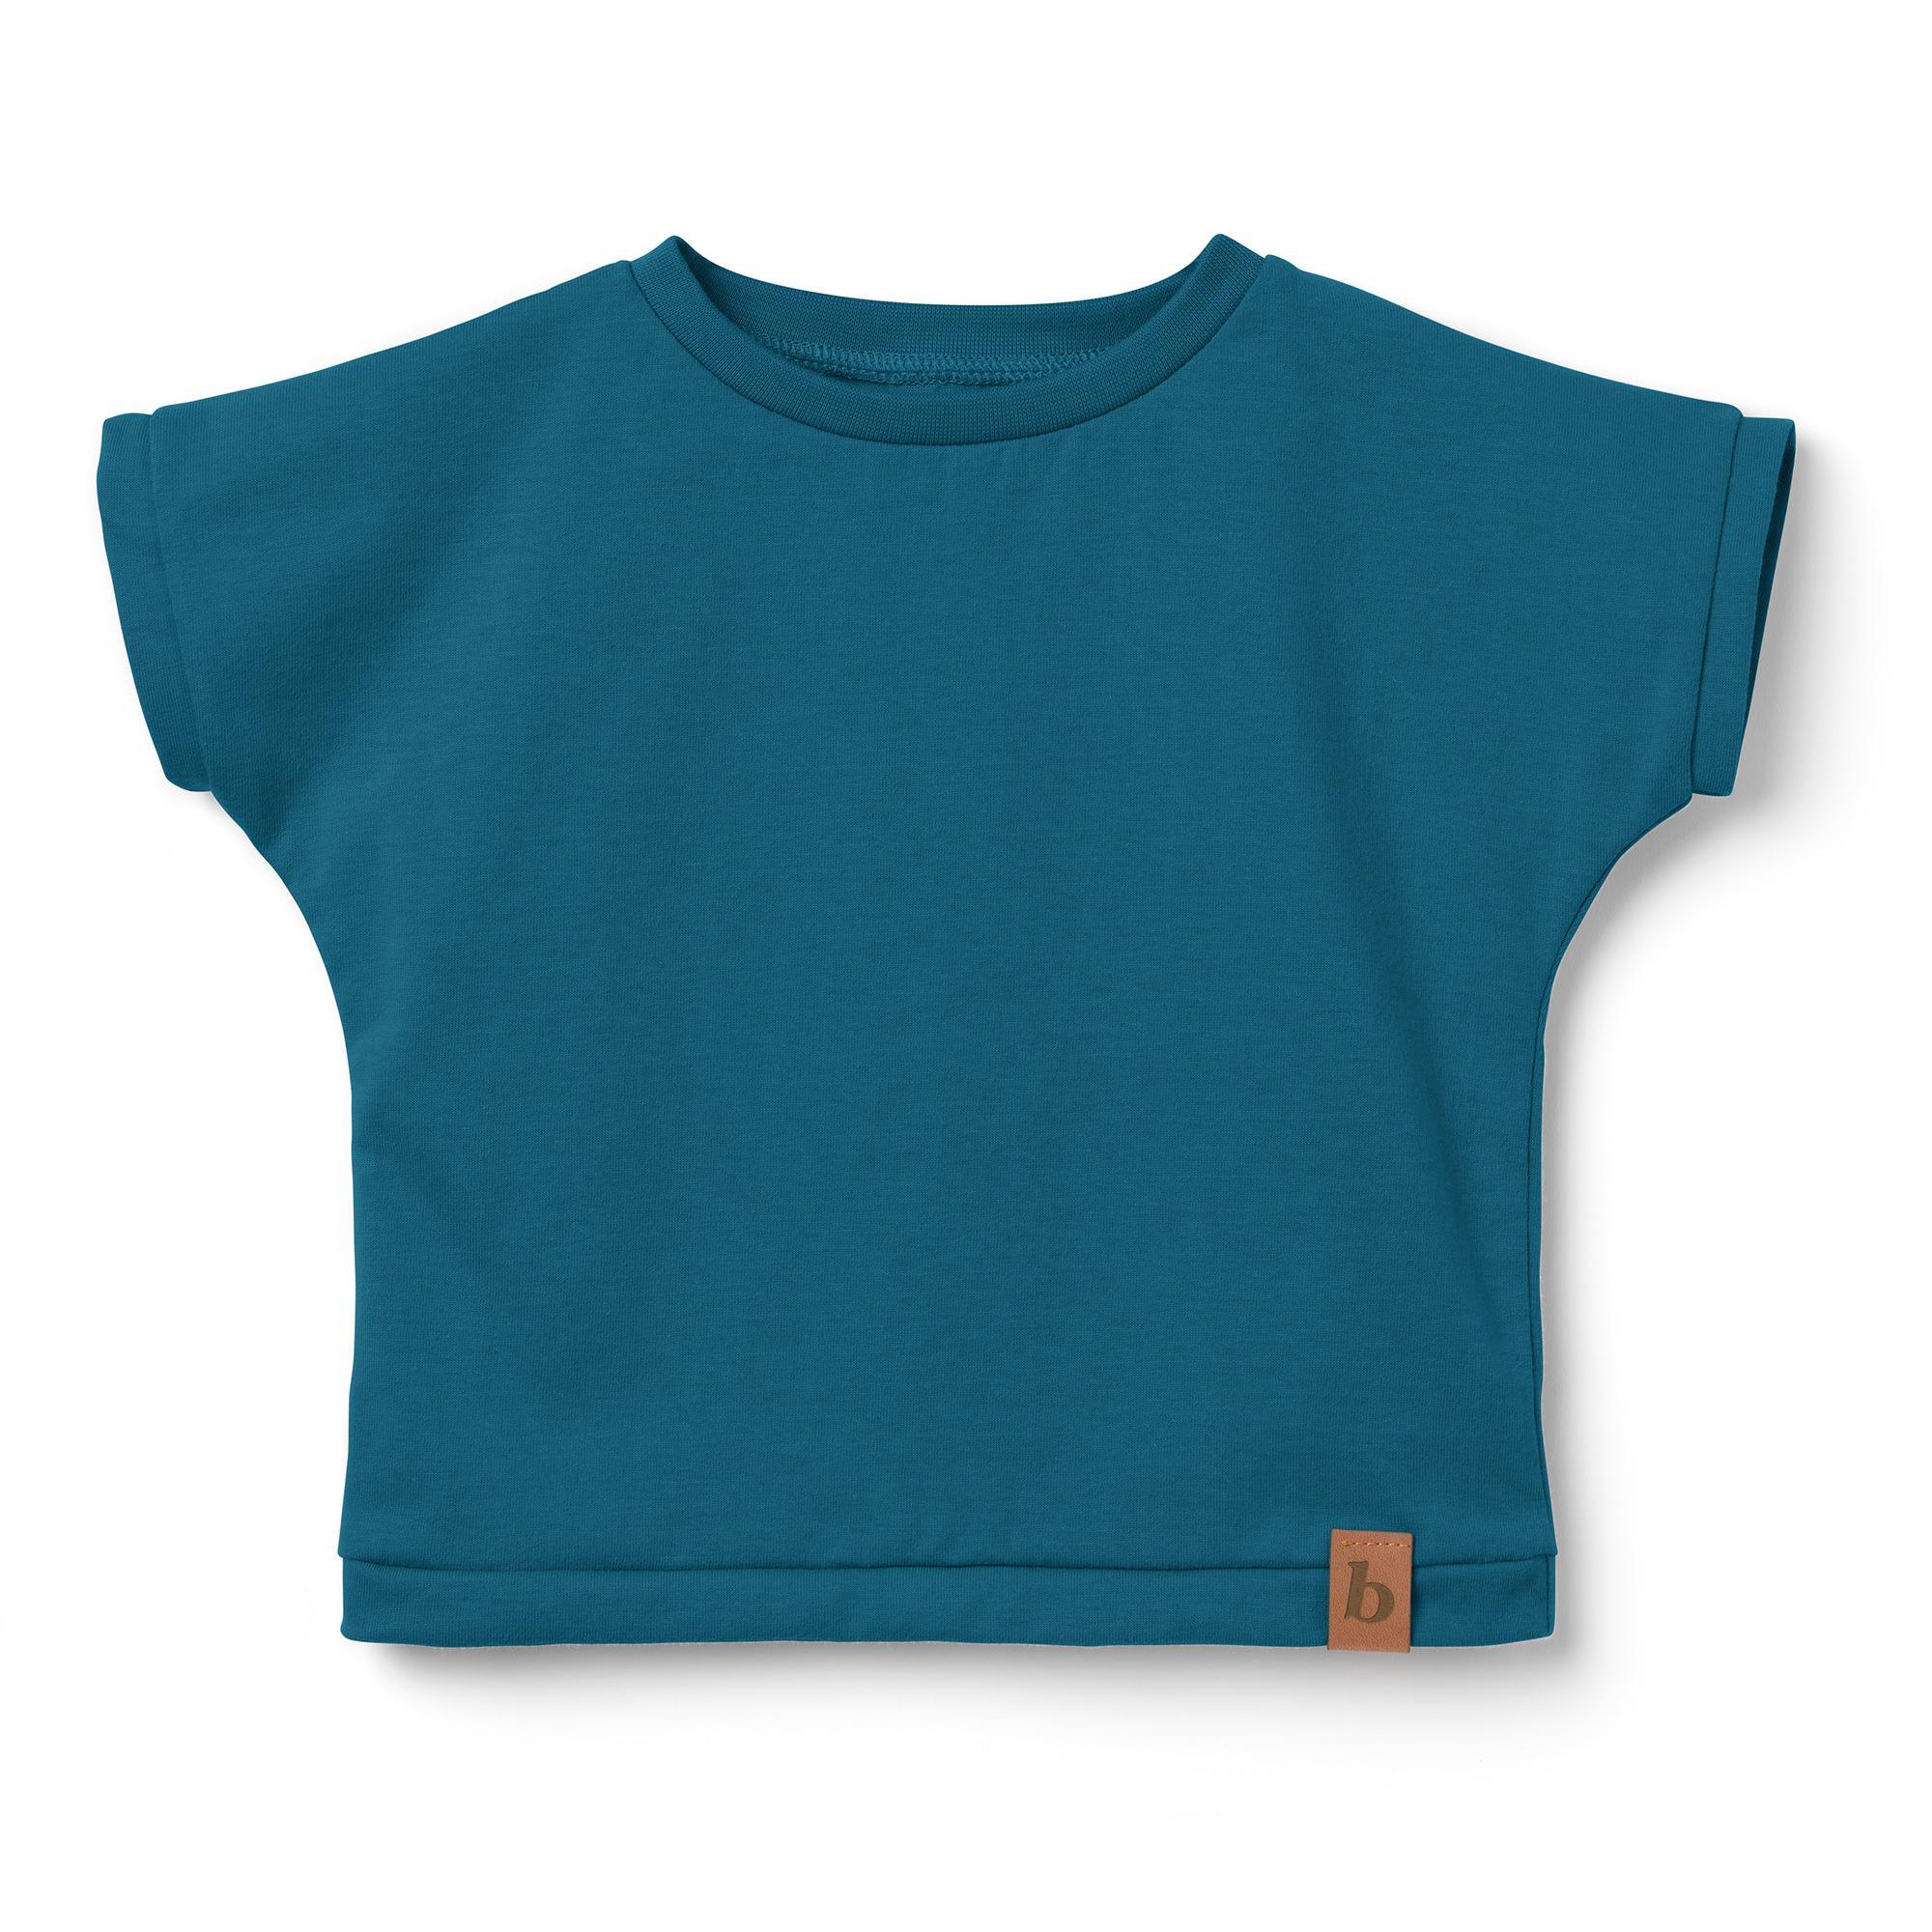 T-shirt dziecięcy, koszulka- morski granat - Bubalove